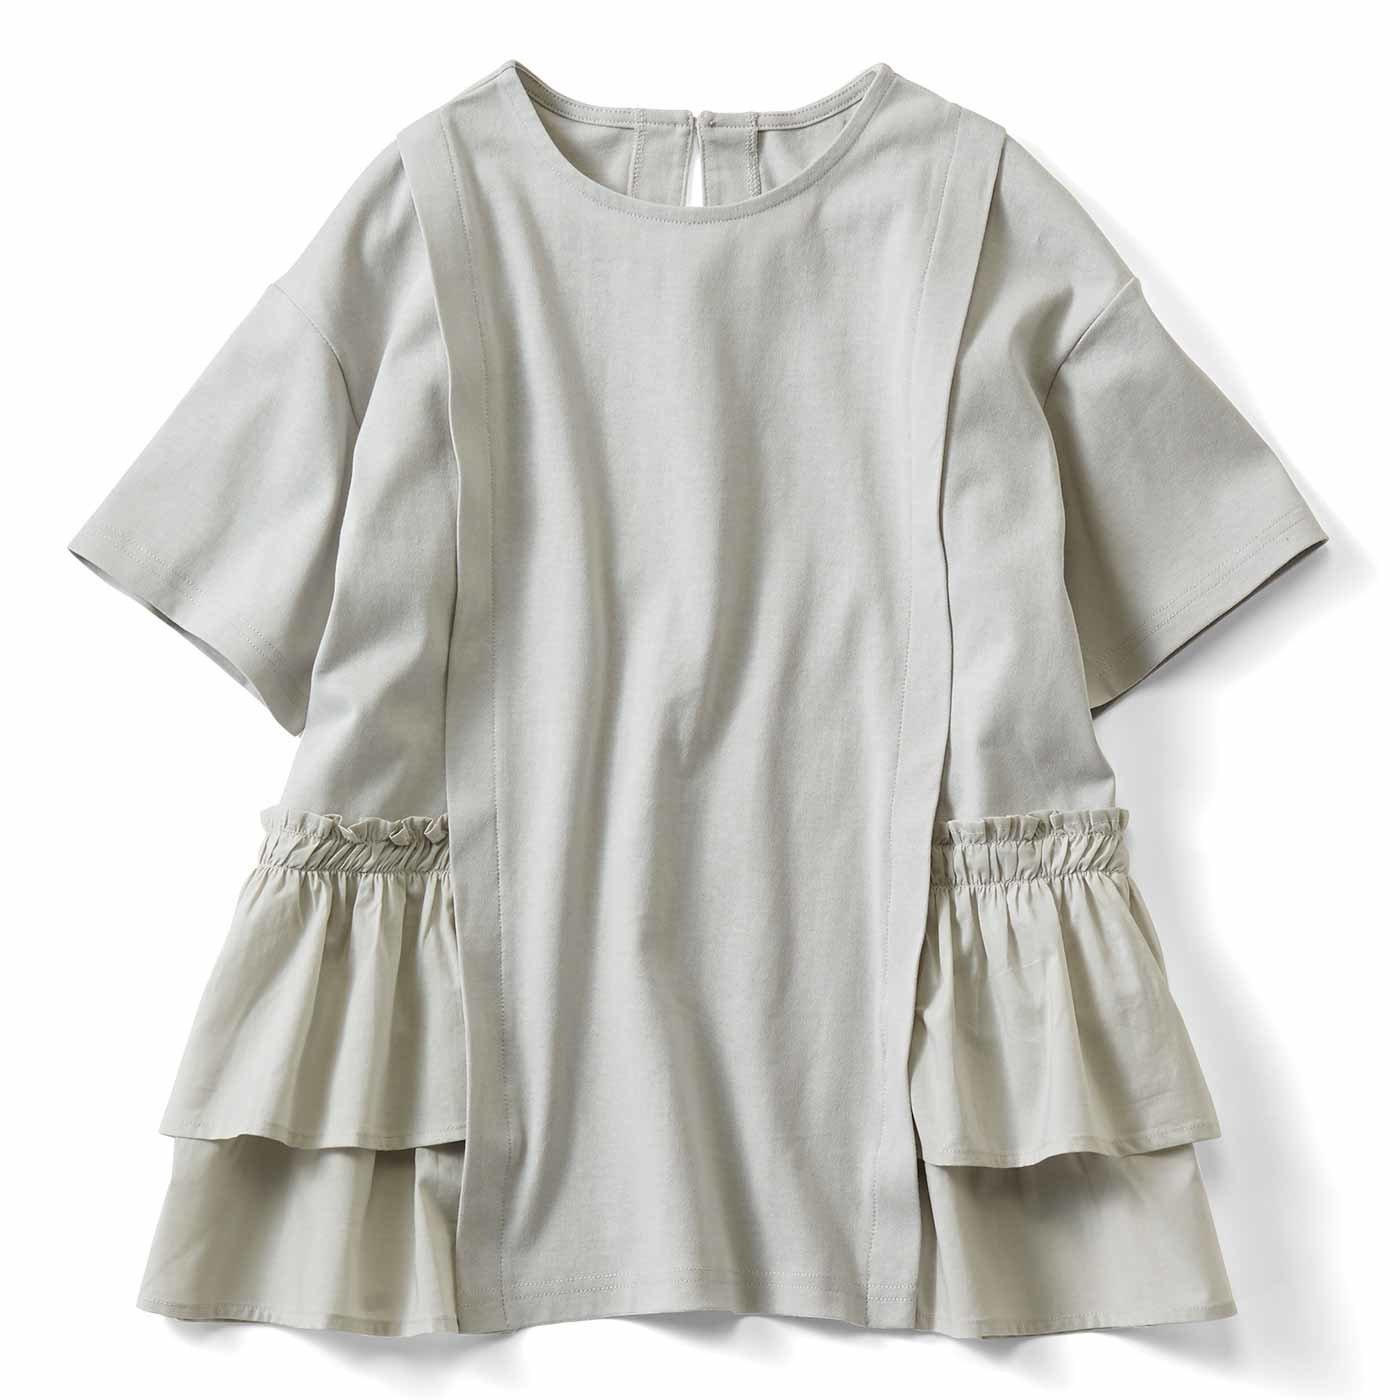 IEDIT[イディット] 汗じみ軽減加工をほどこした異素材遣いTシャツ〈グレー〉